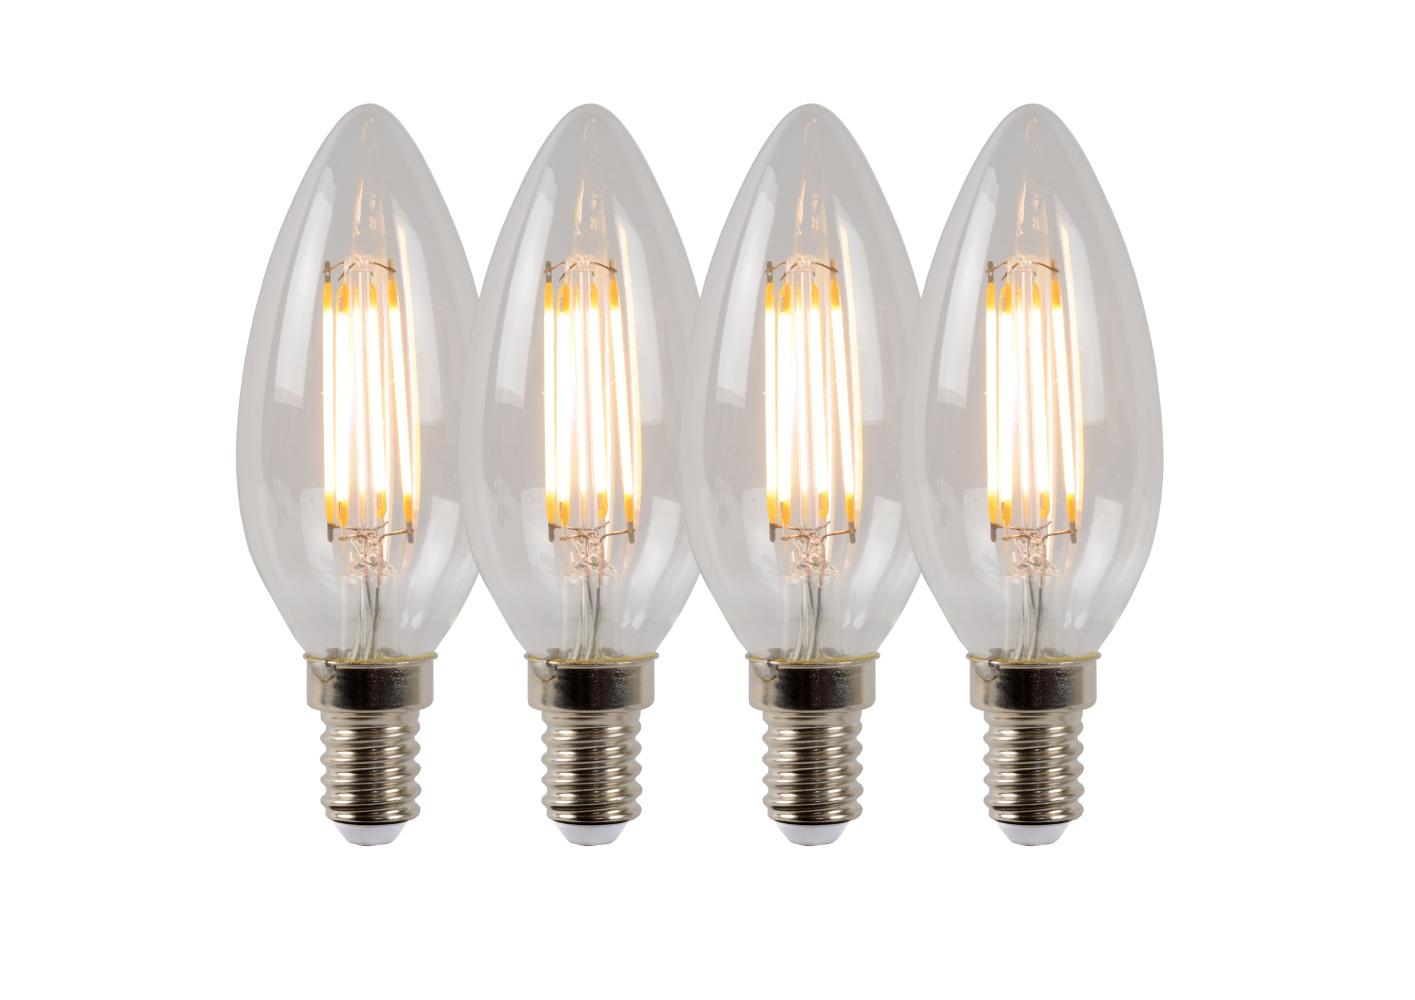 Lucide C35 Fil. lamp-Transp.-LED Dimb.-4xE14-4W-2700K